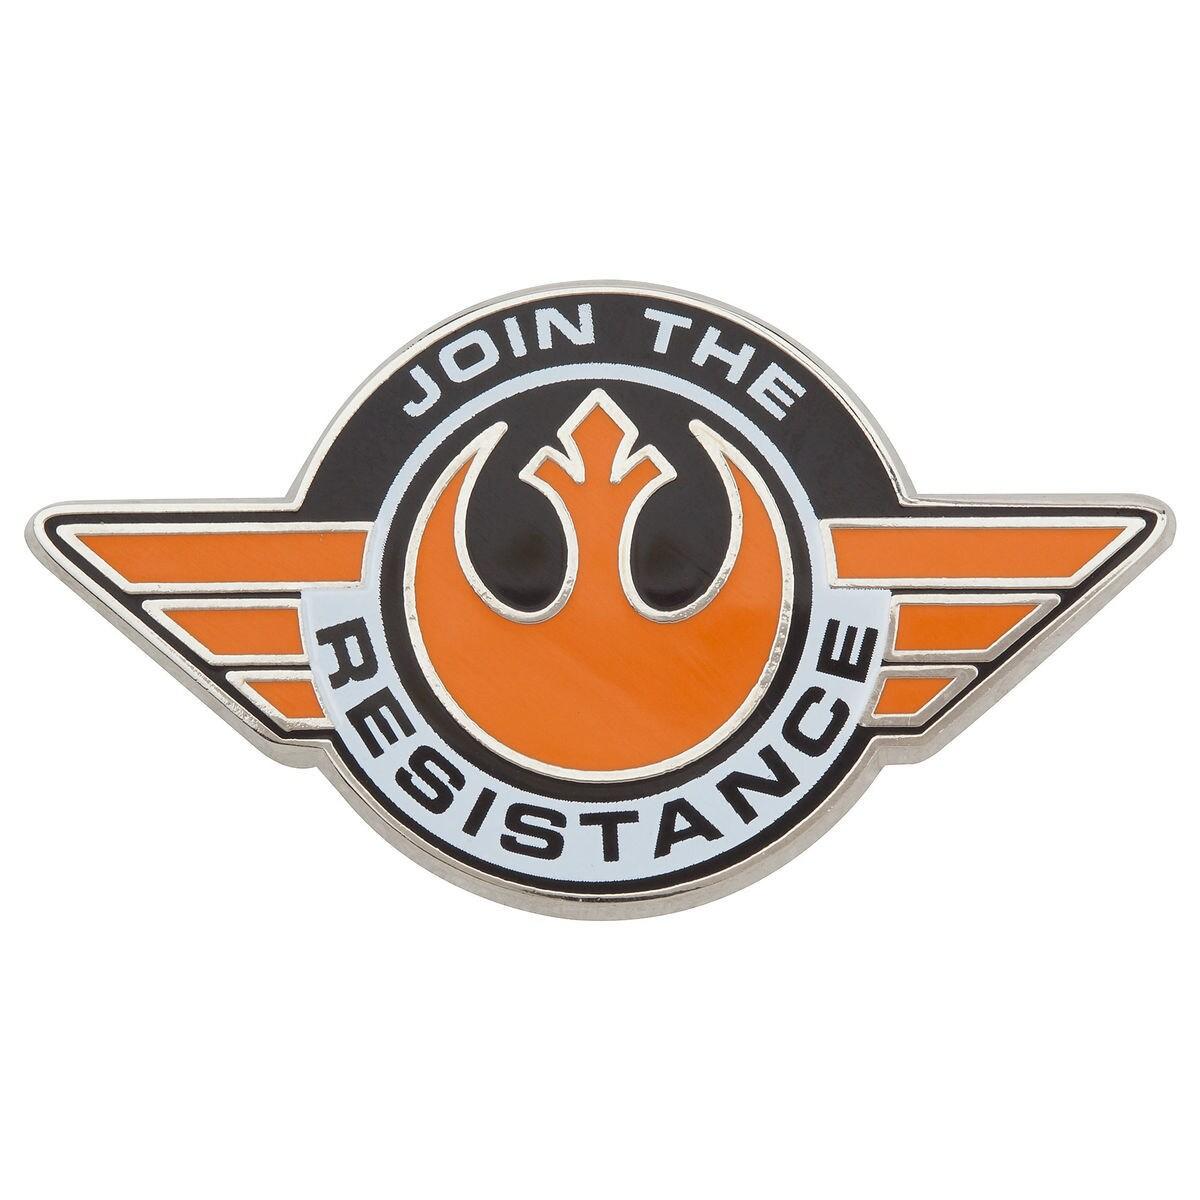 Rebel Alliance Starbird Pin Star Wars The Force Awakens Shopdisney